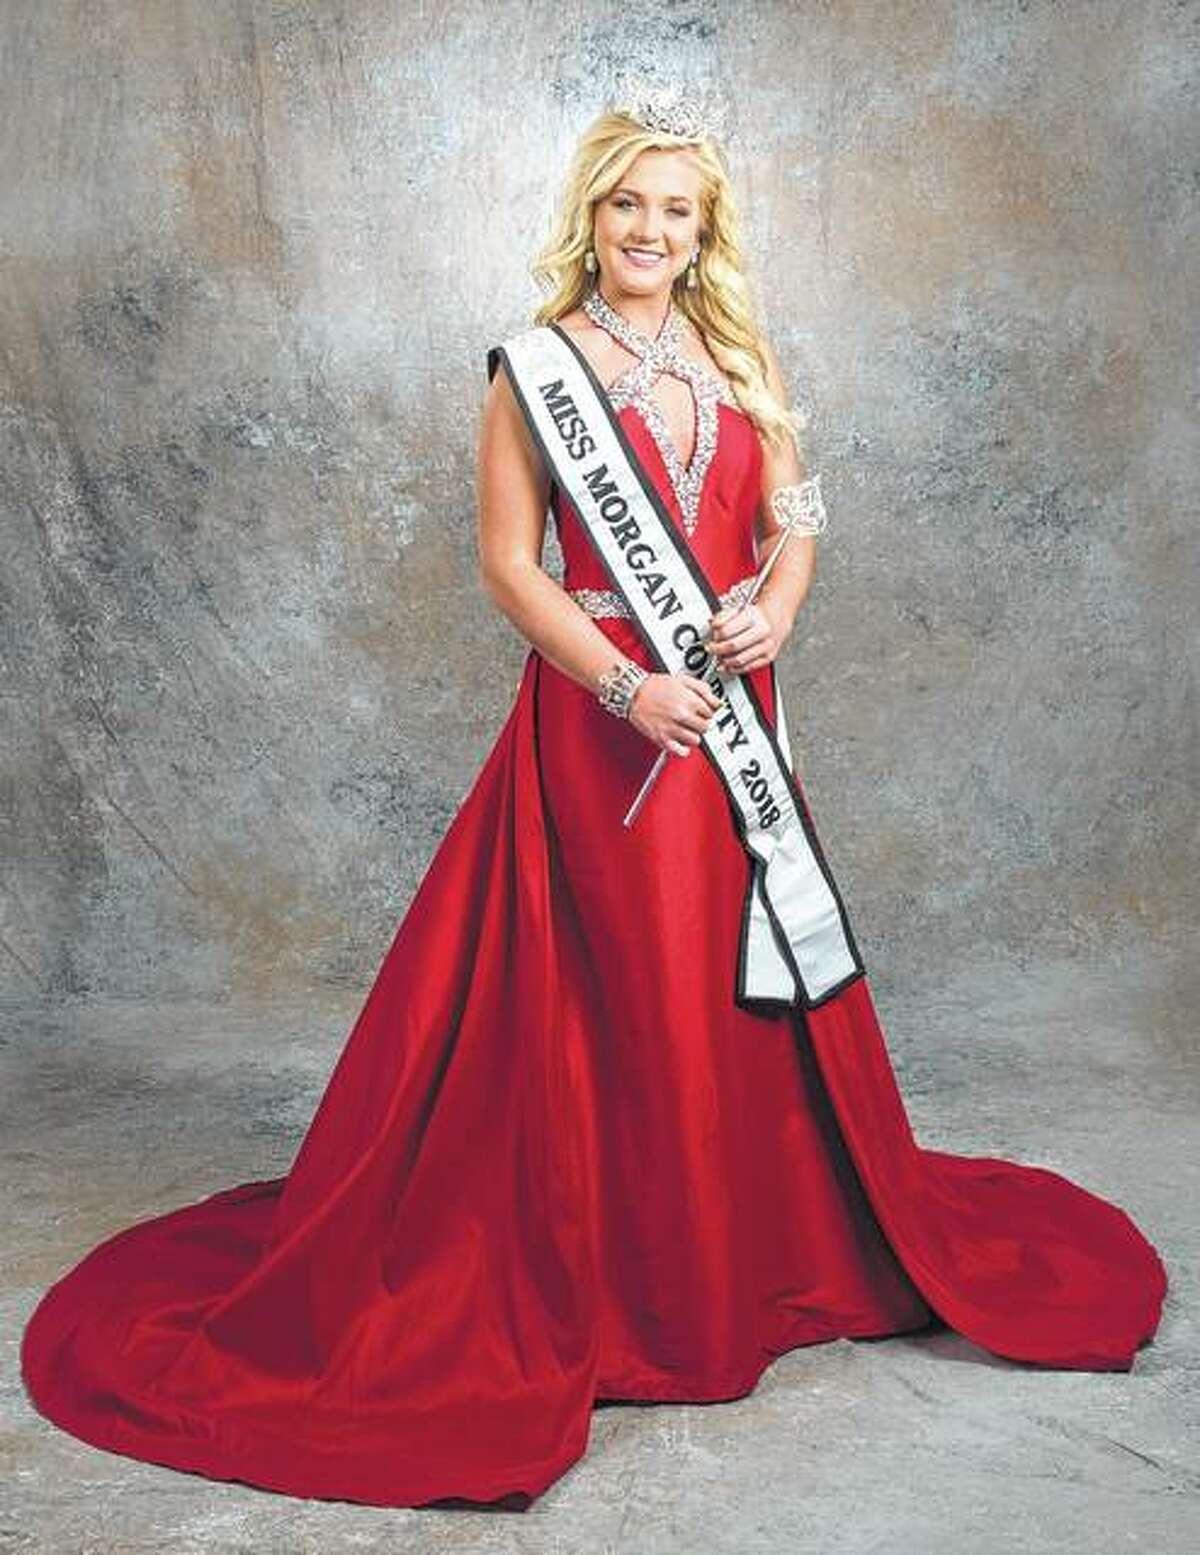 Miss Morgan County 2018 Savannah Long will compete this week